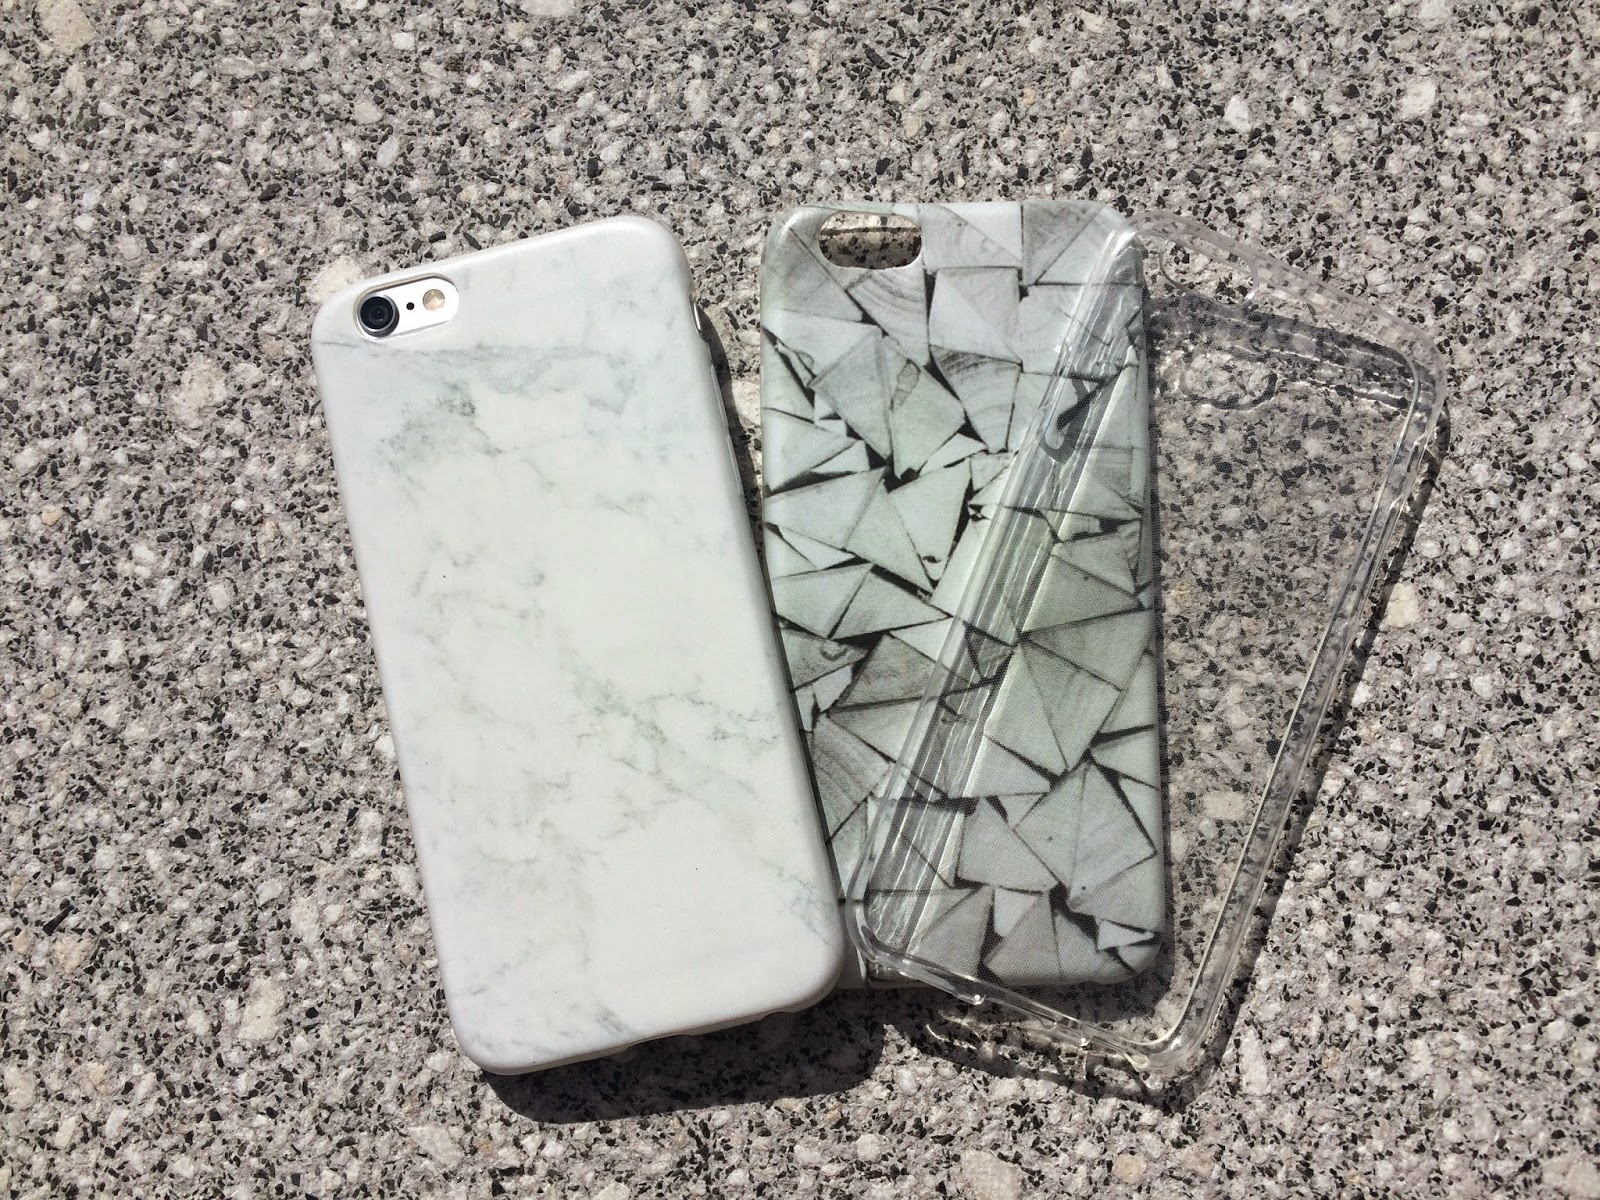 iphone 6 case, funny-case.pl recenzja, opinie